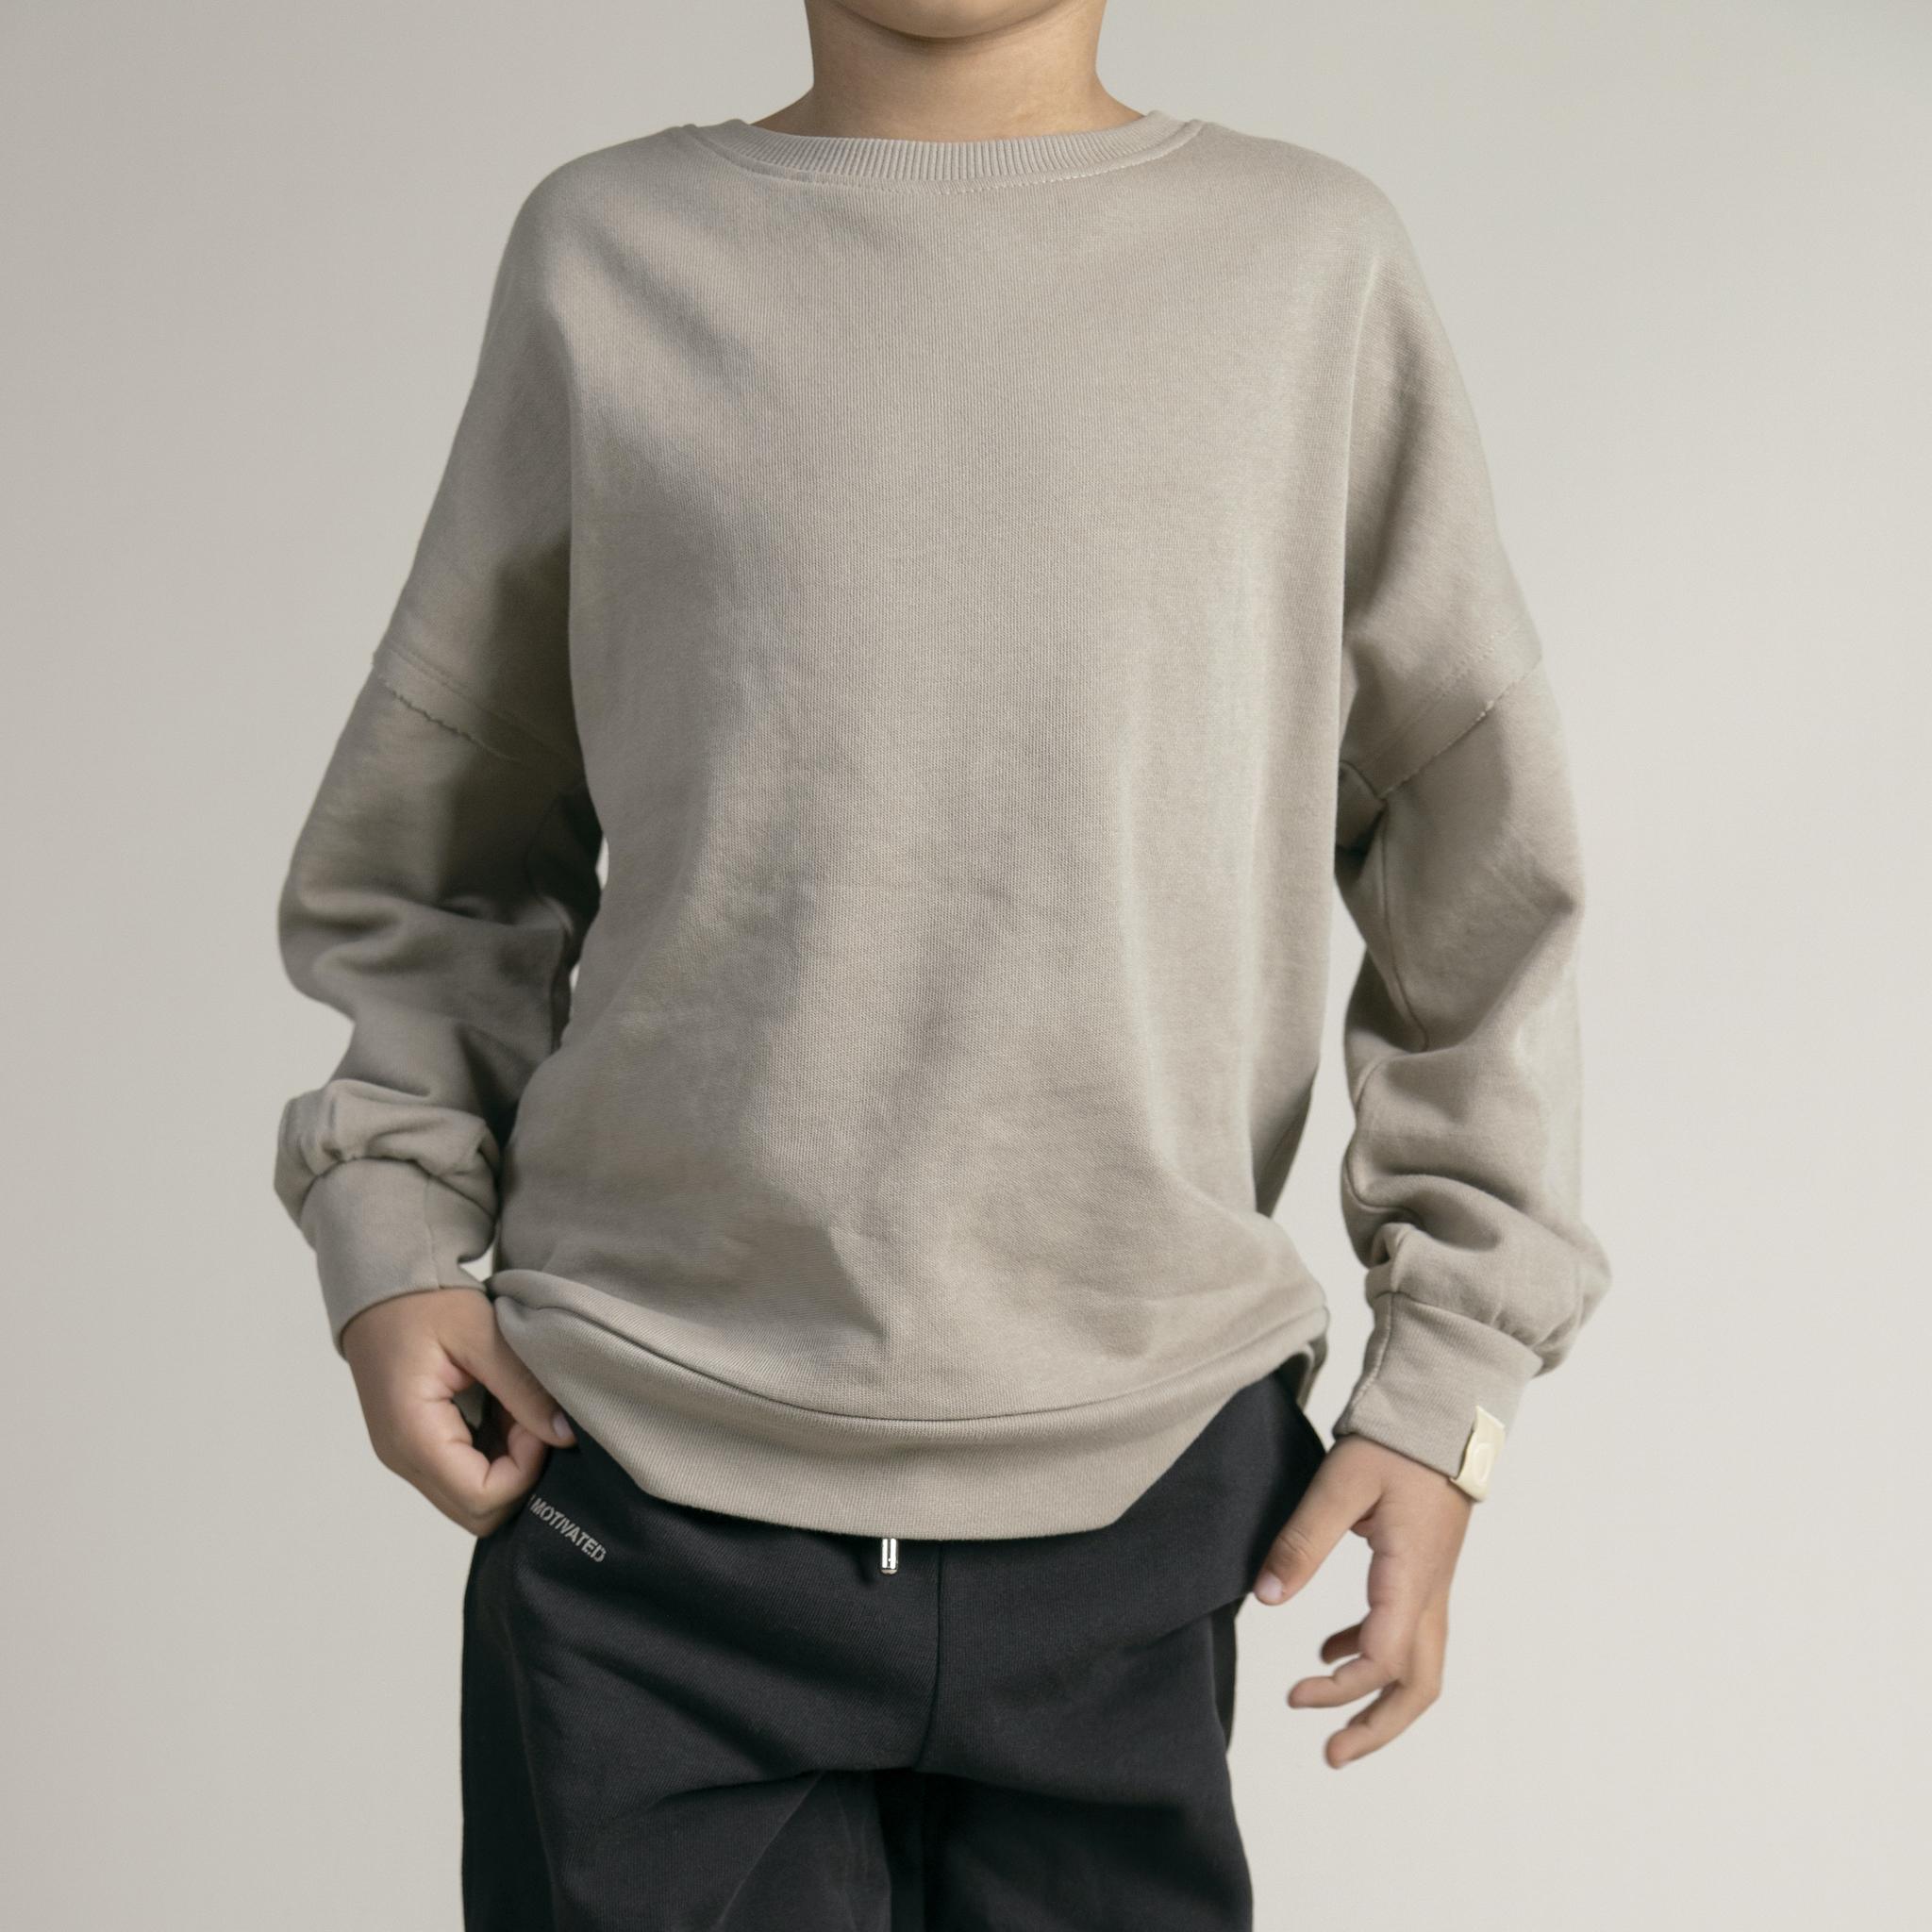 I dig denim - Mike Sweater Organic - beige